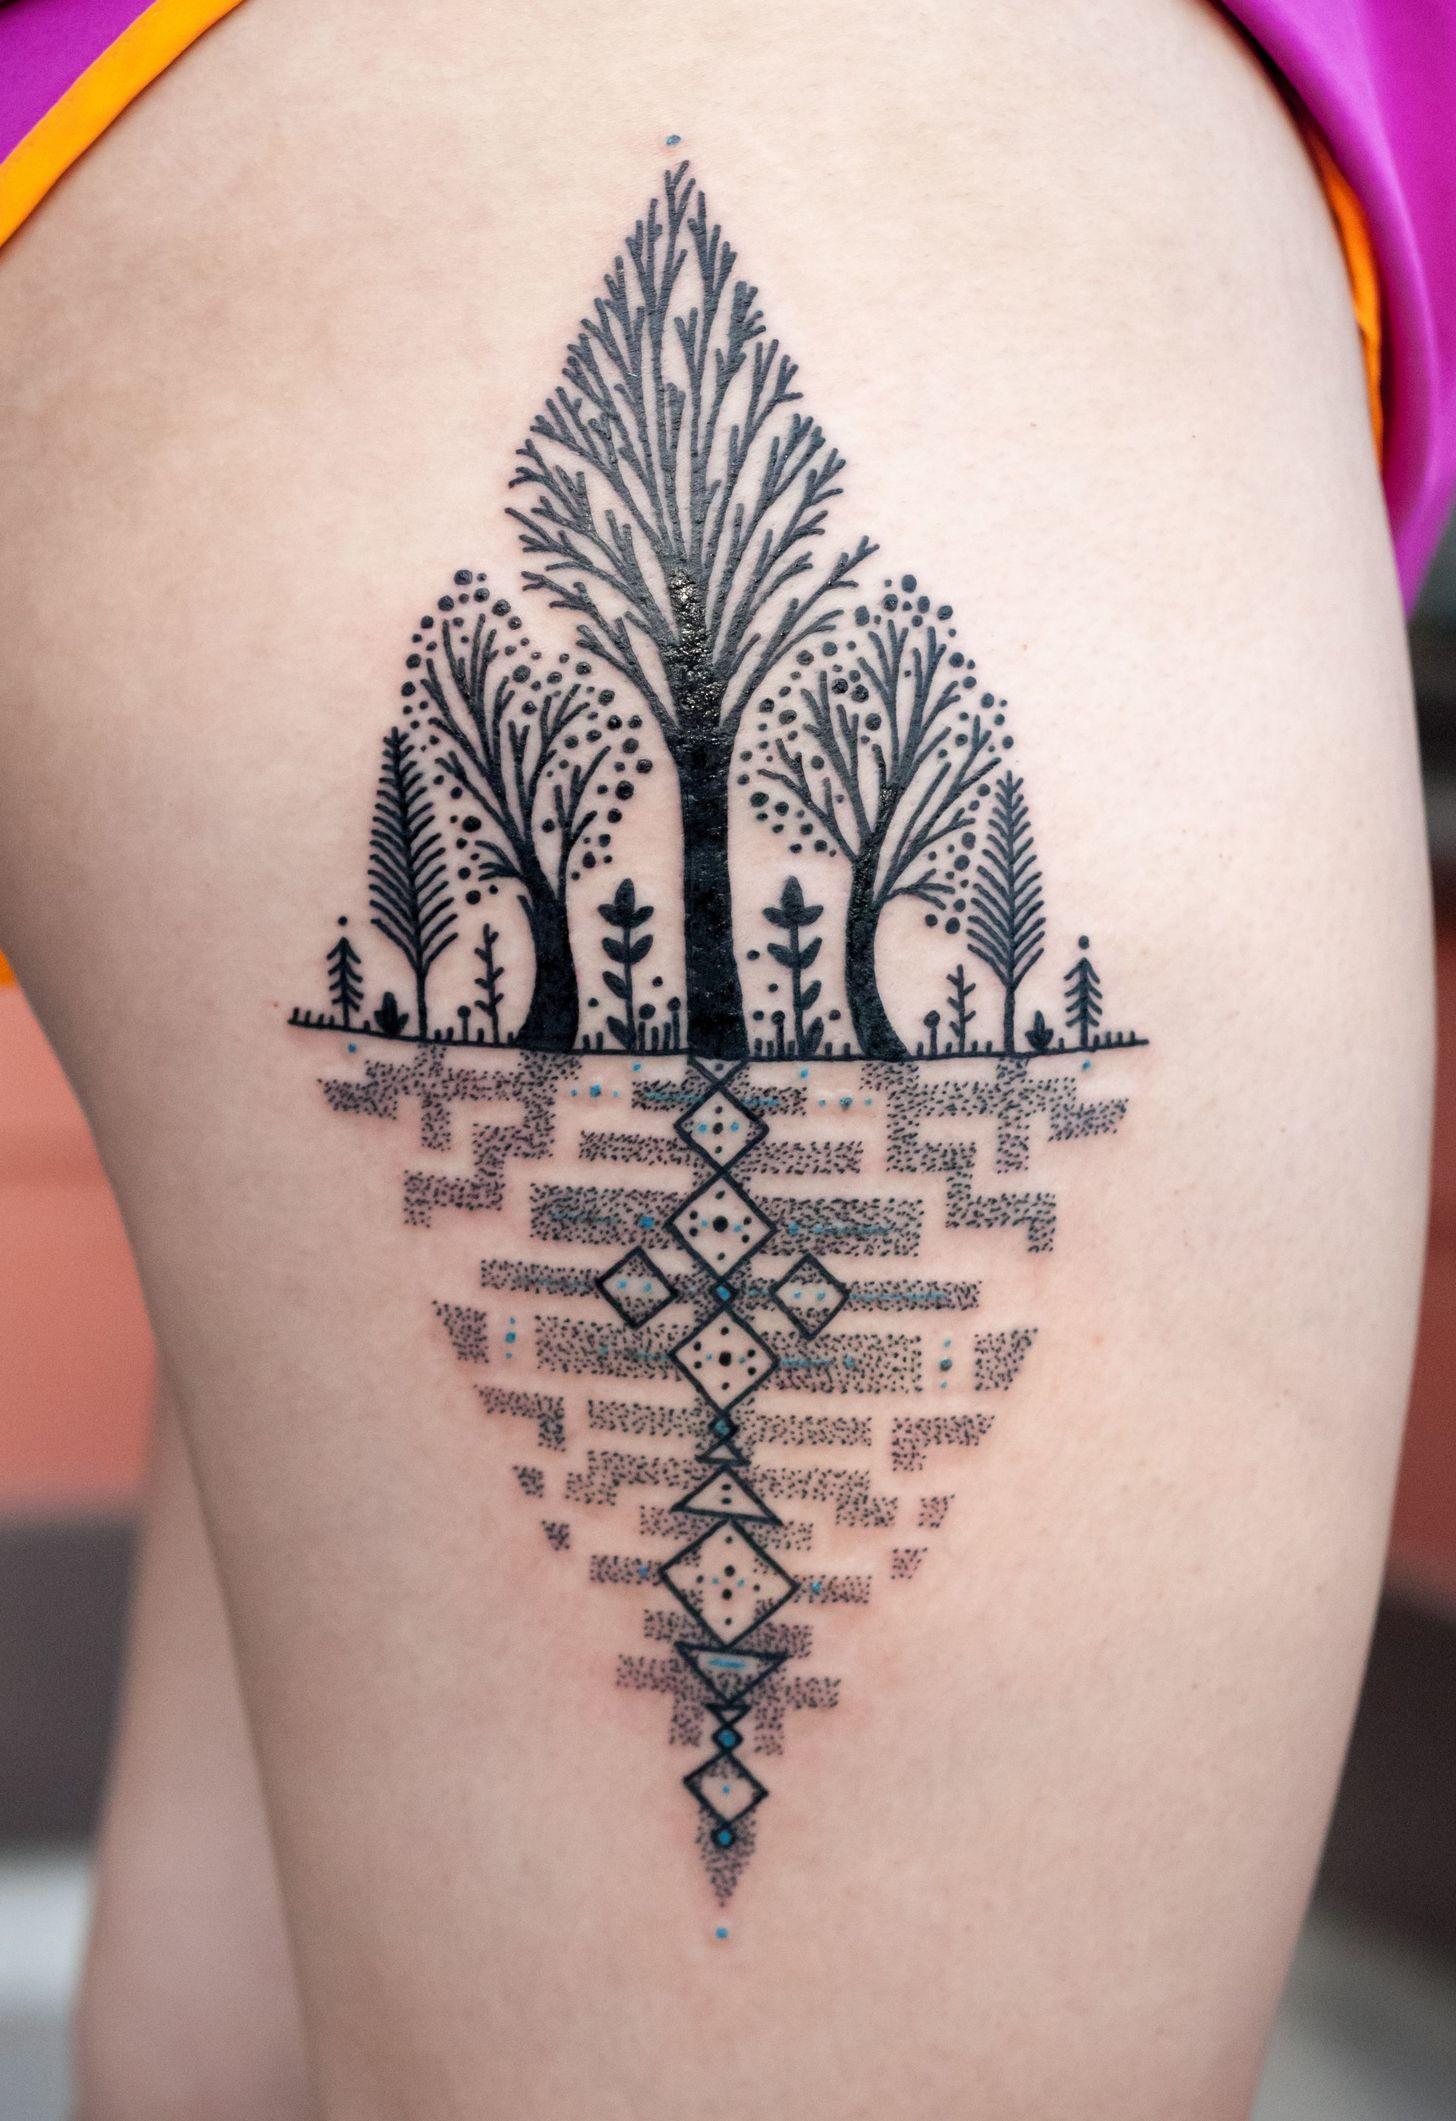 Geometric Tattoos Portland: Collaboration Piece By David Hale And Kris Davidson Done